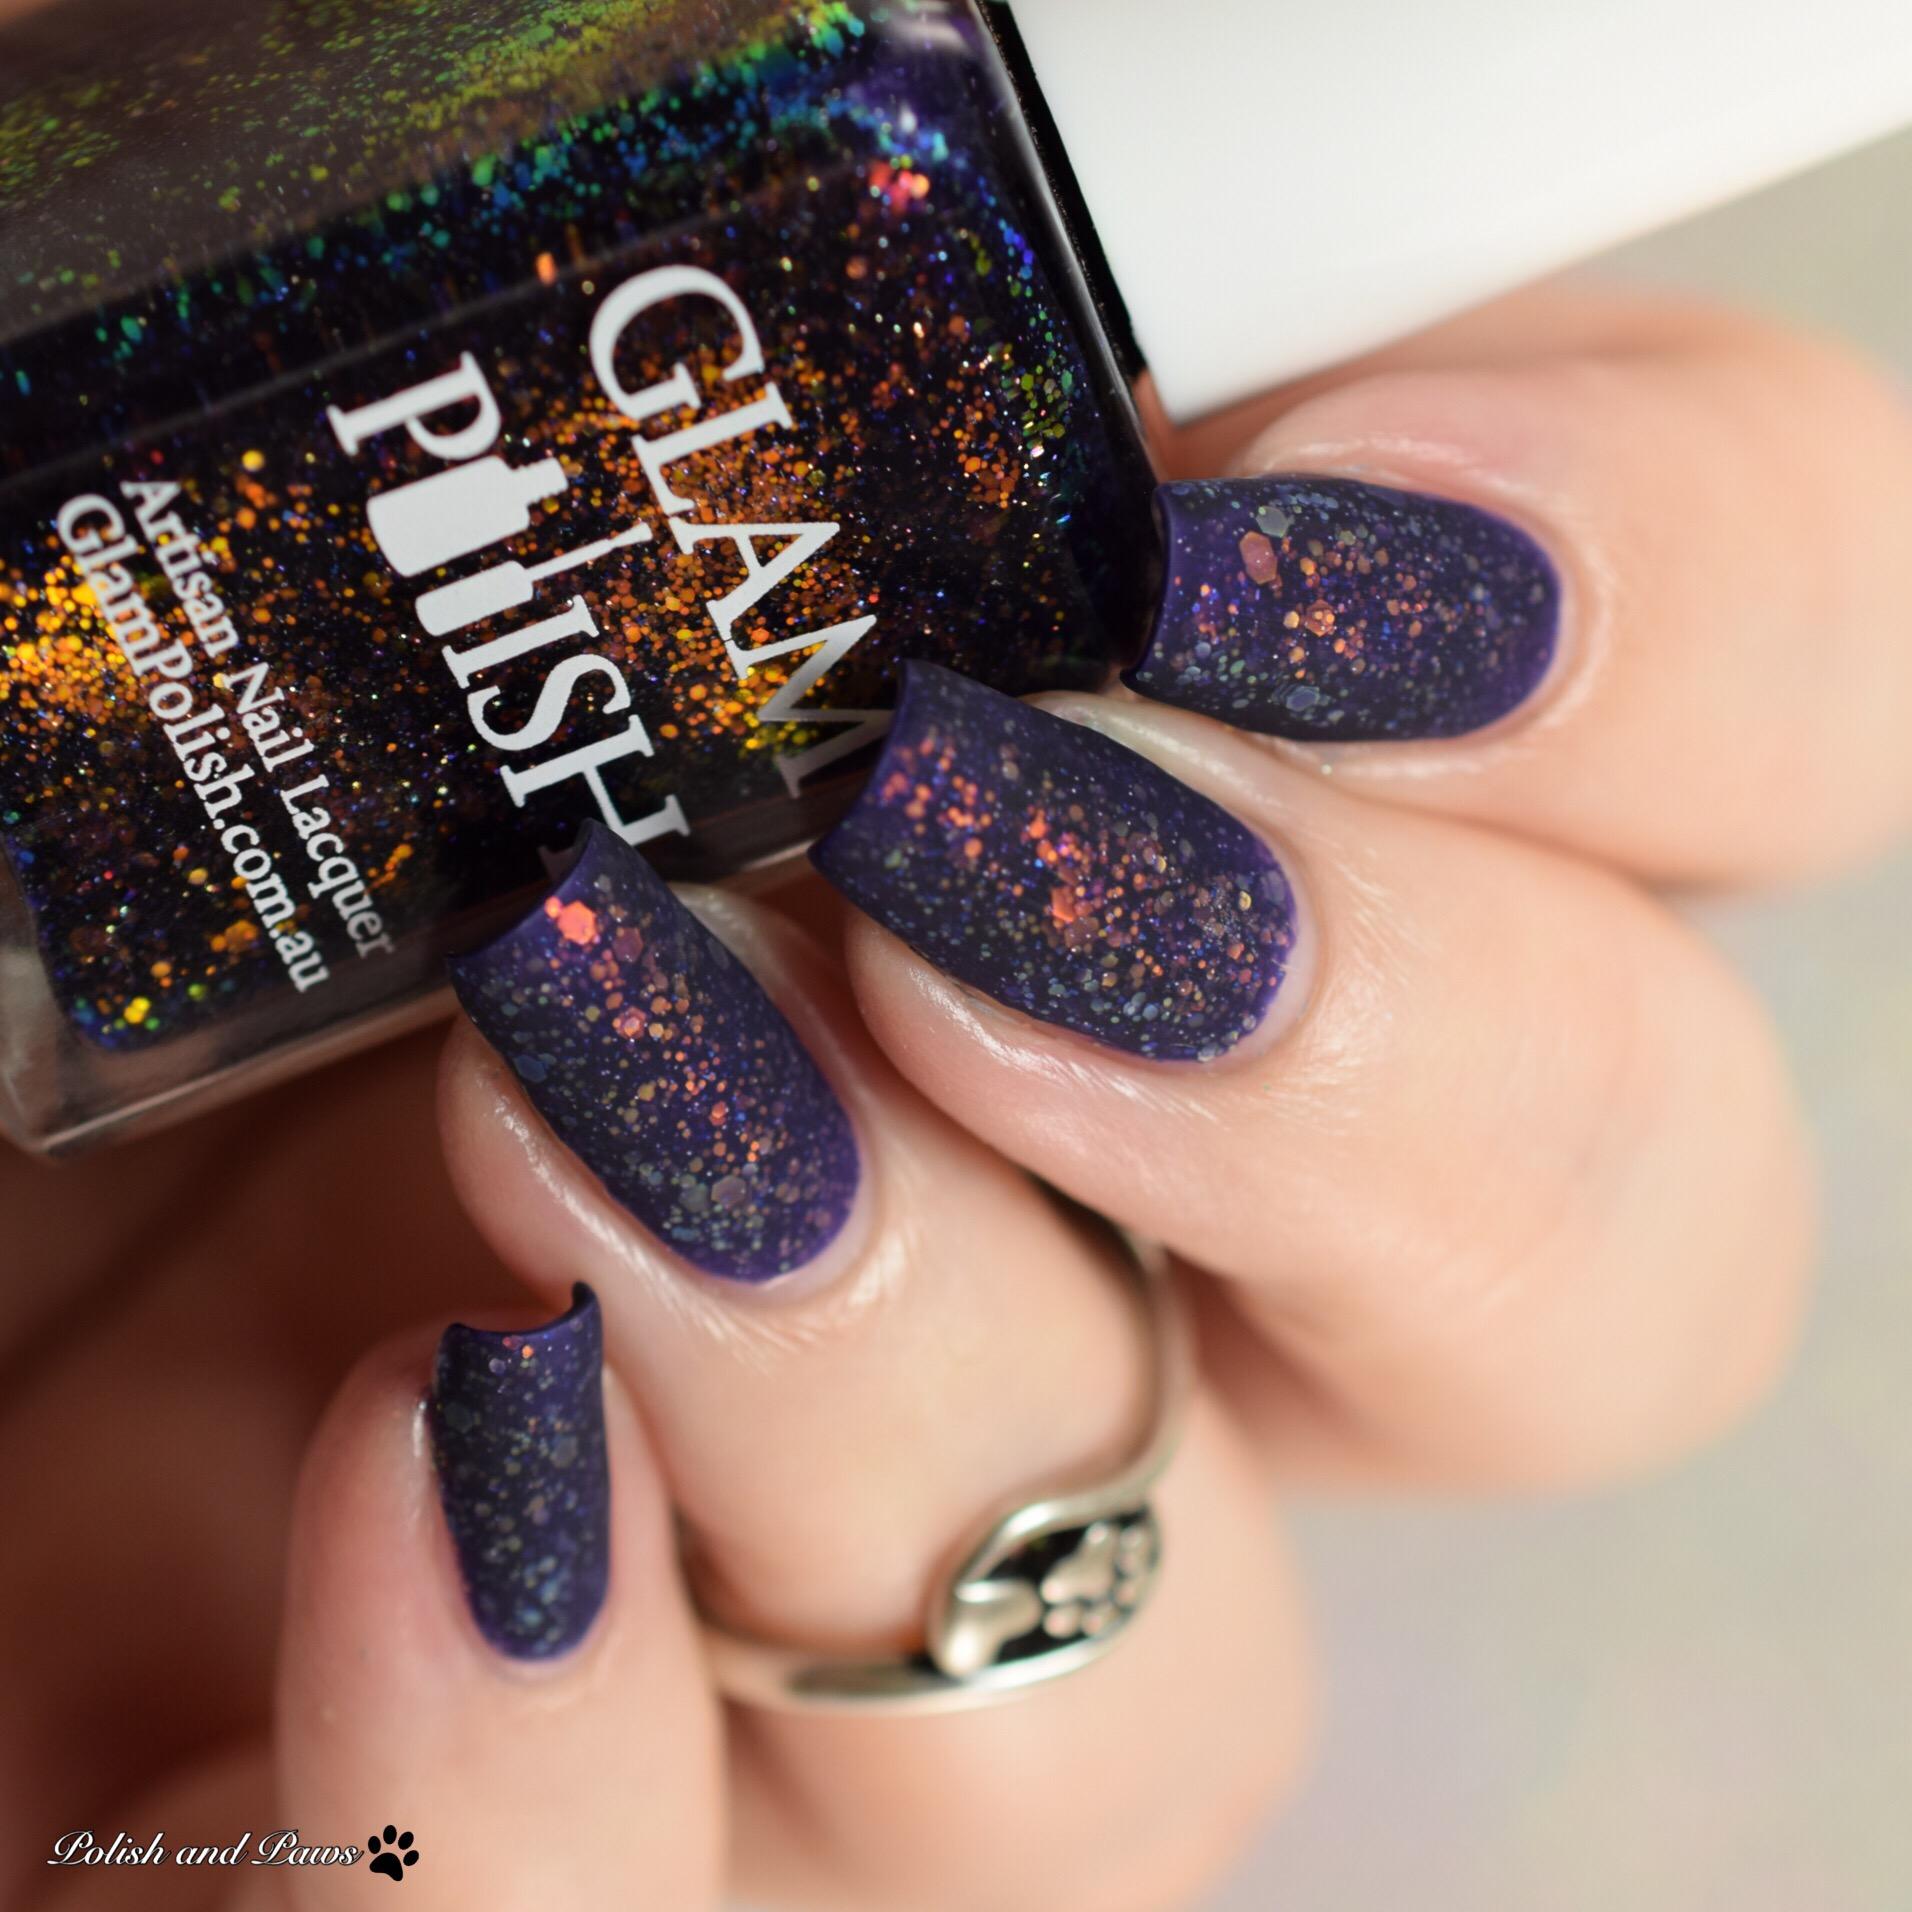 Glam Polish Dungeons & Dragons